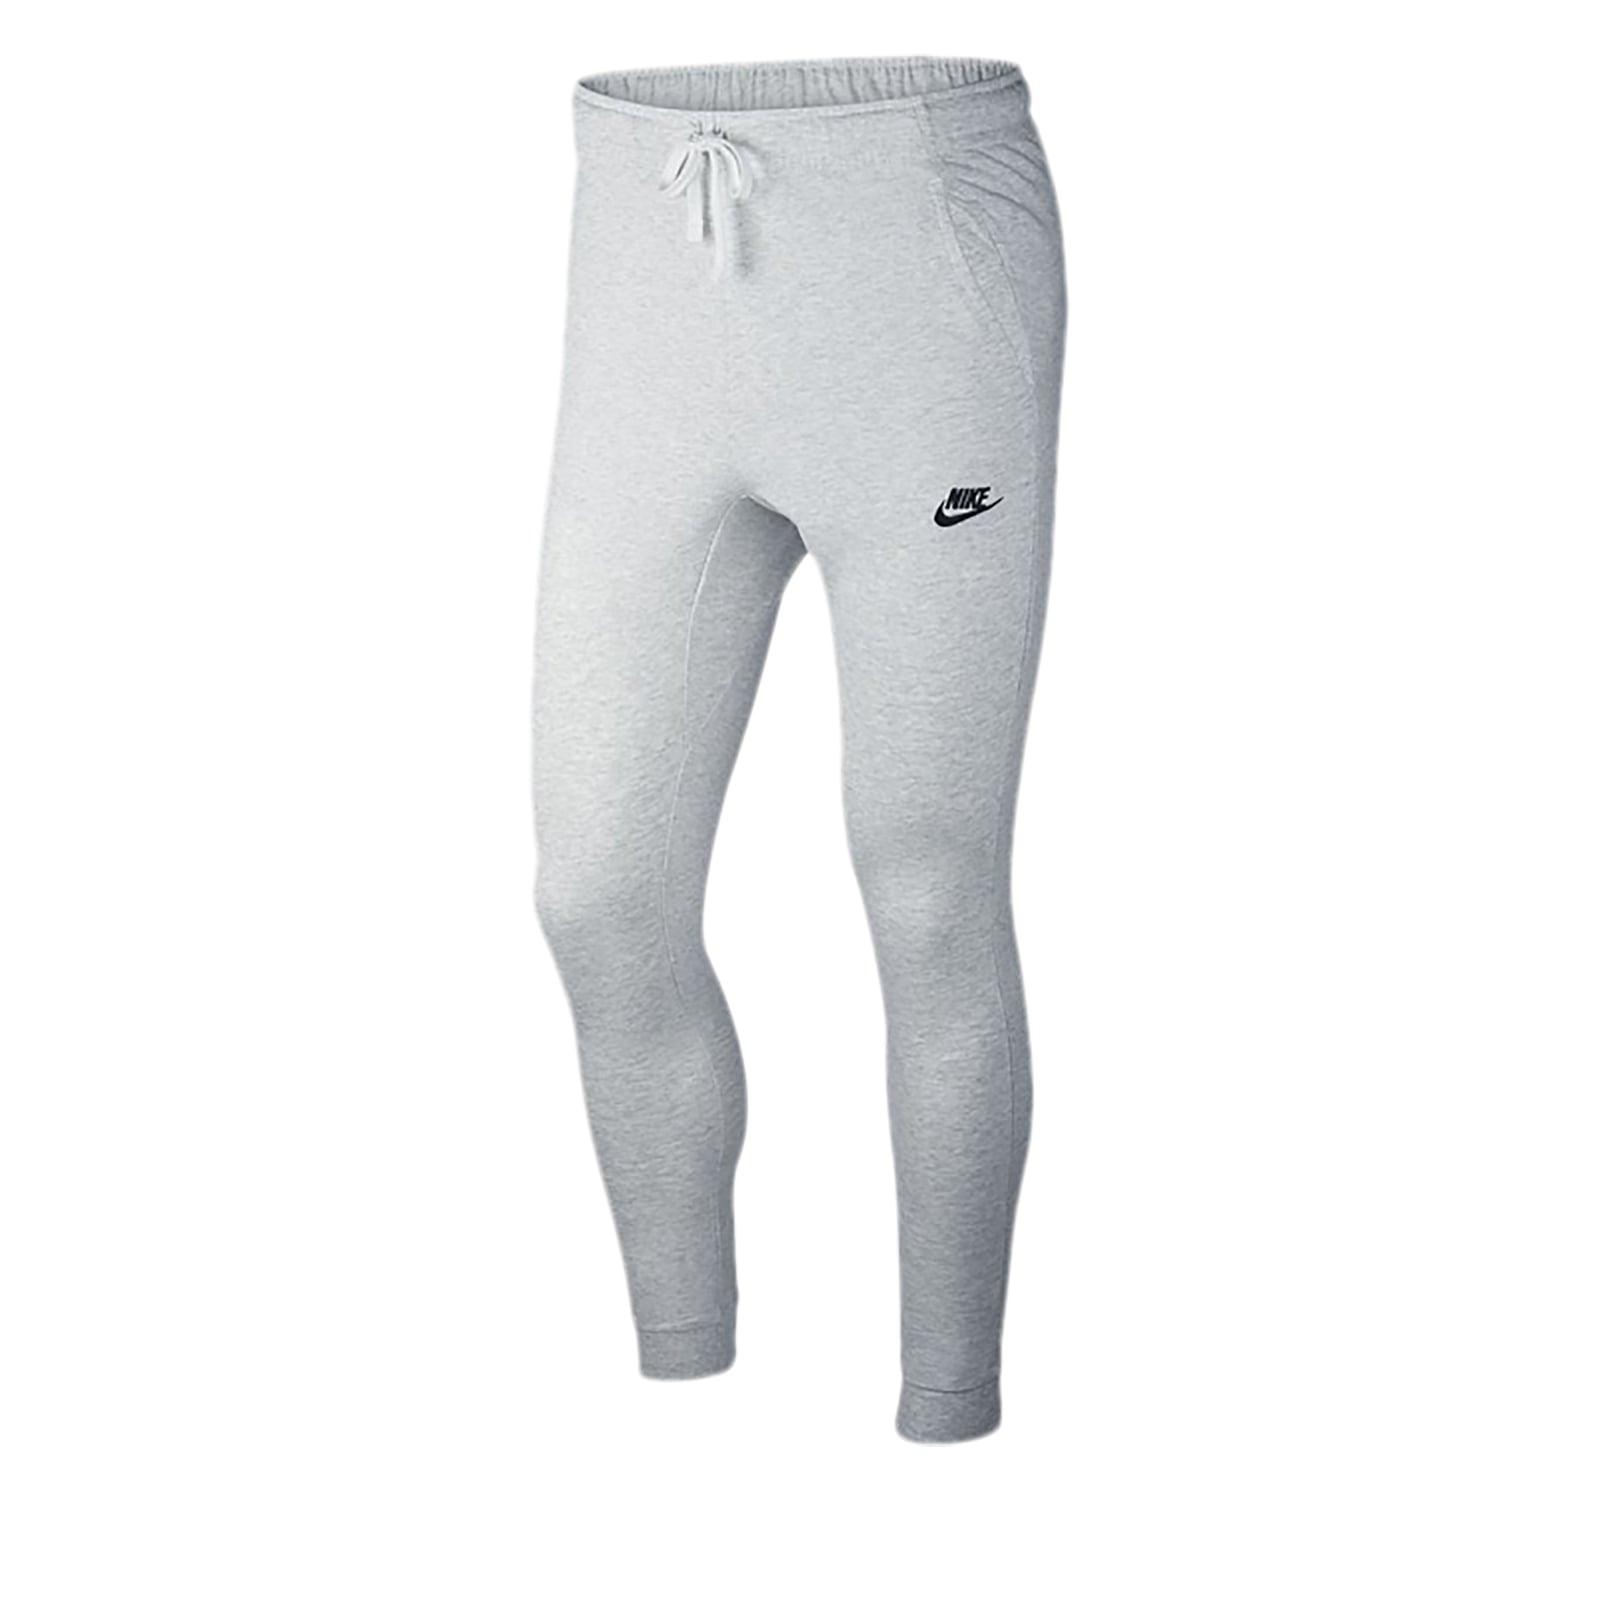 c3c49d1eef4c Pánske teplákové nohavice NIKE-Mens Nike Sportswear Jogger BIRCH HE ...